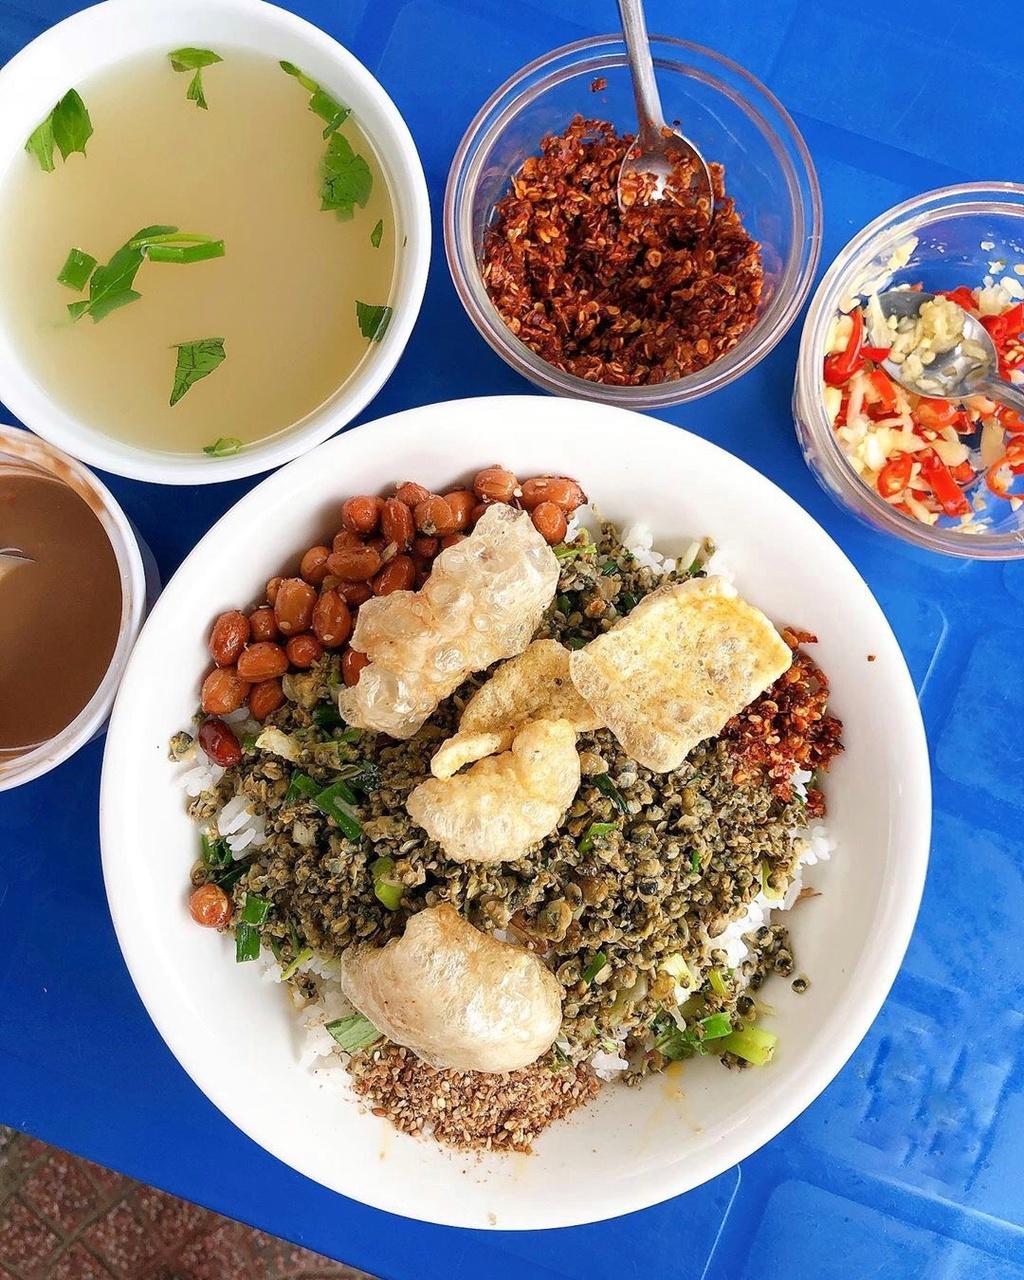 4 mon com chinh phuc du khach tai Viet Nam hinh anh 7 IMG_3400.JPG